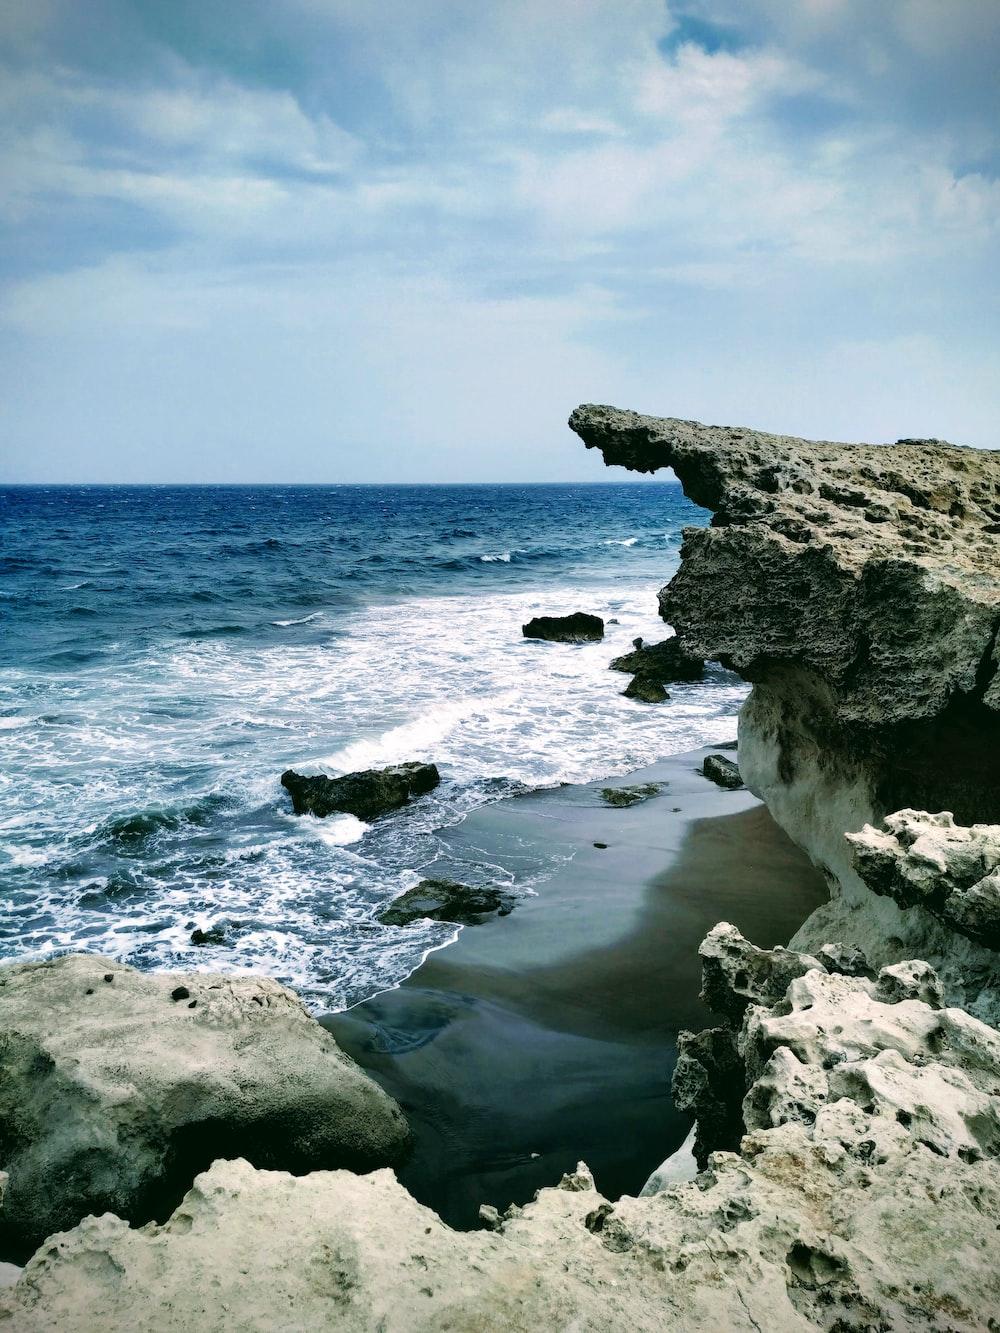 gray large stone on seashore